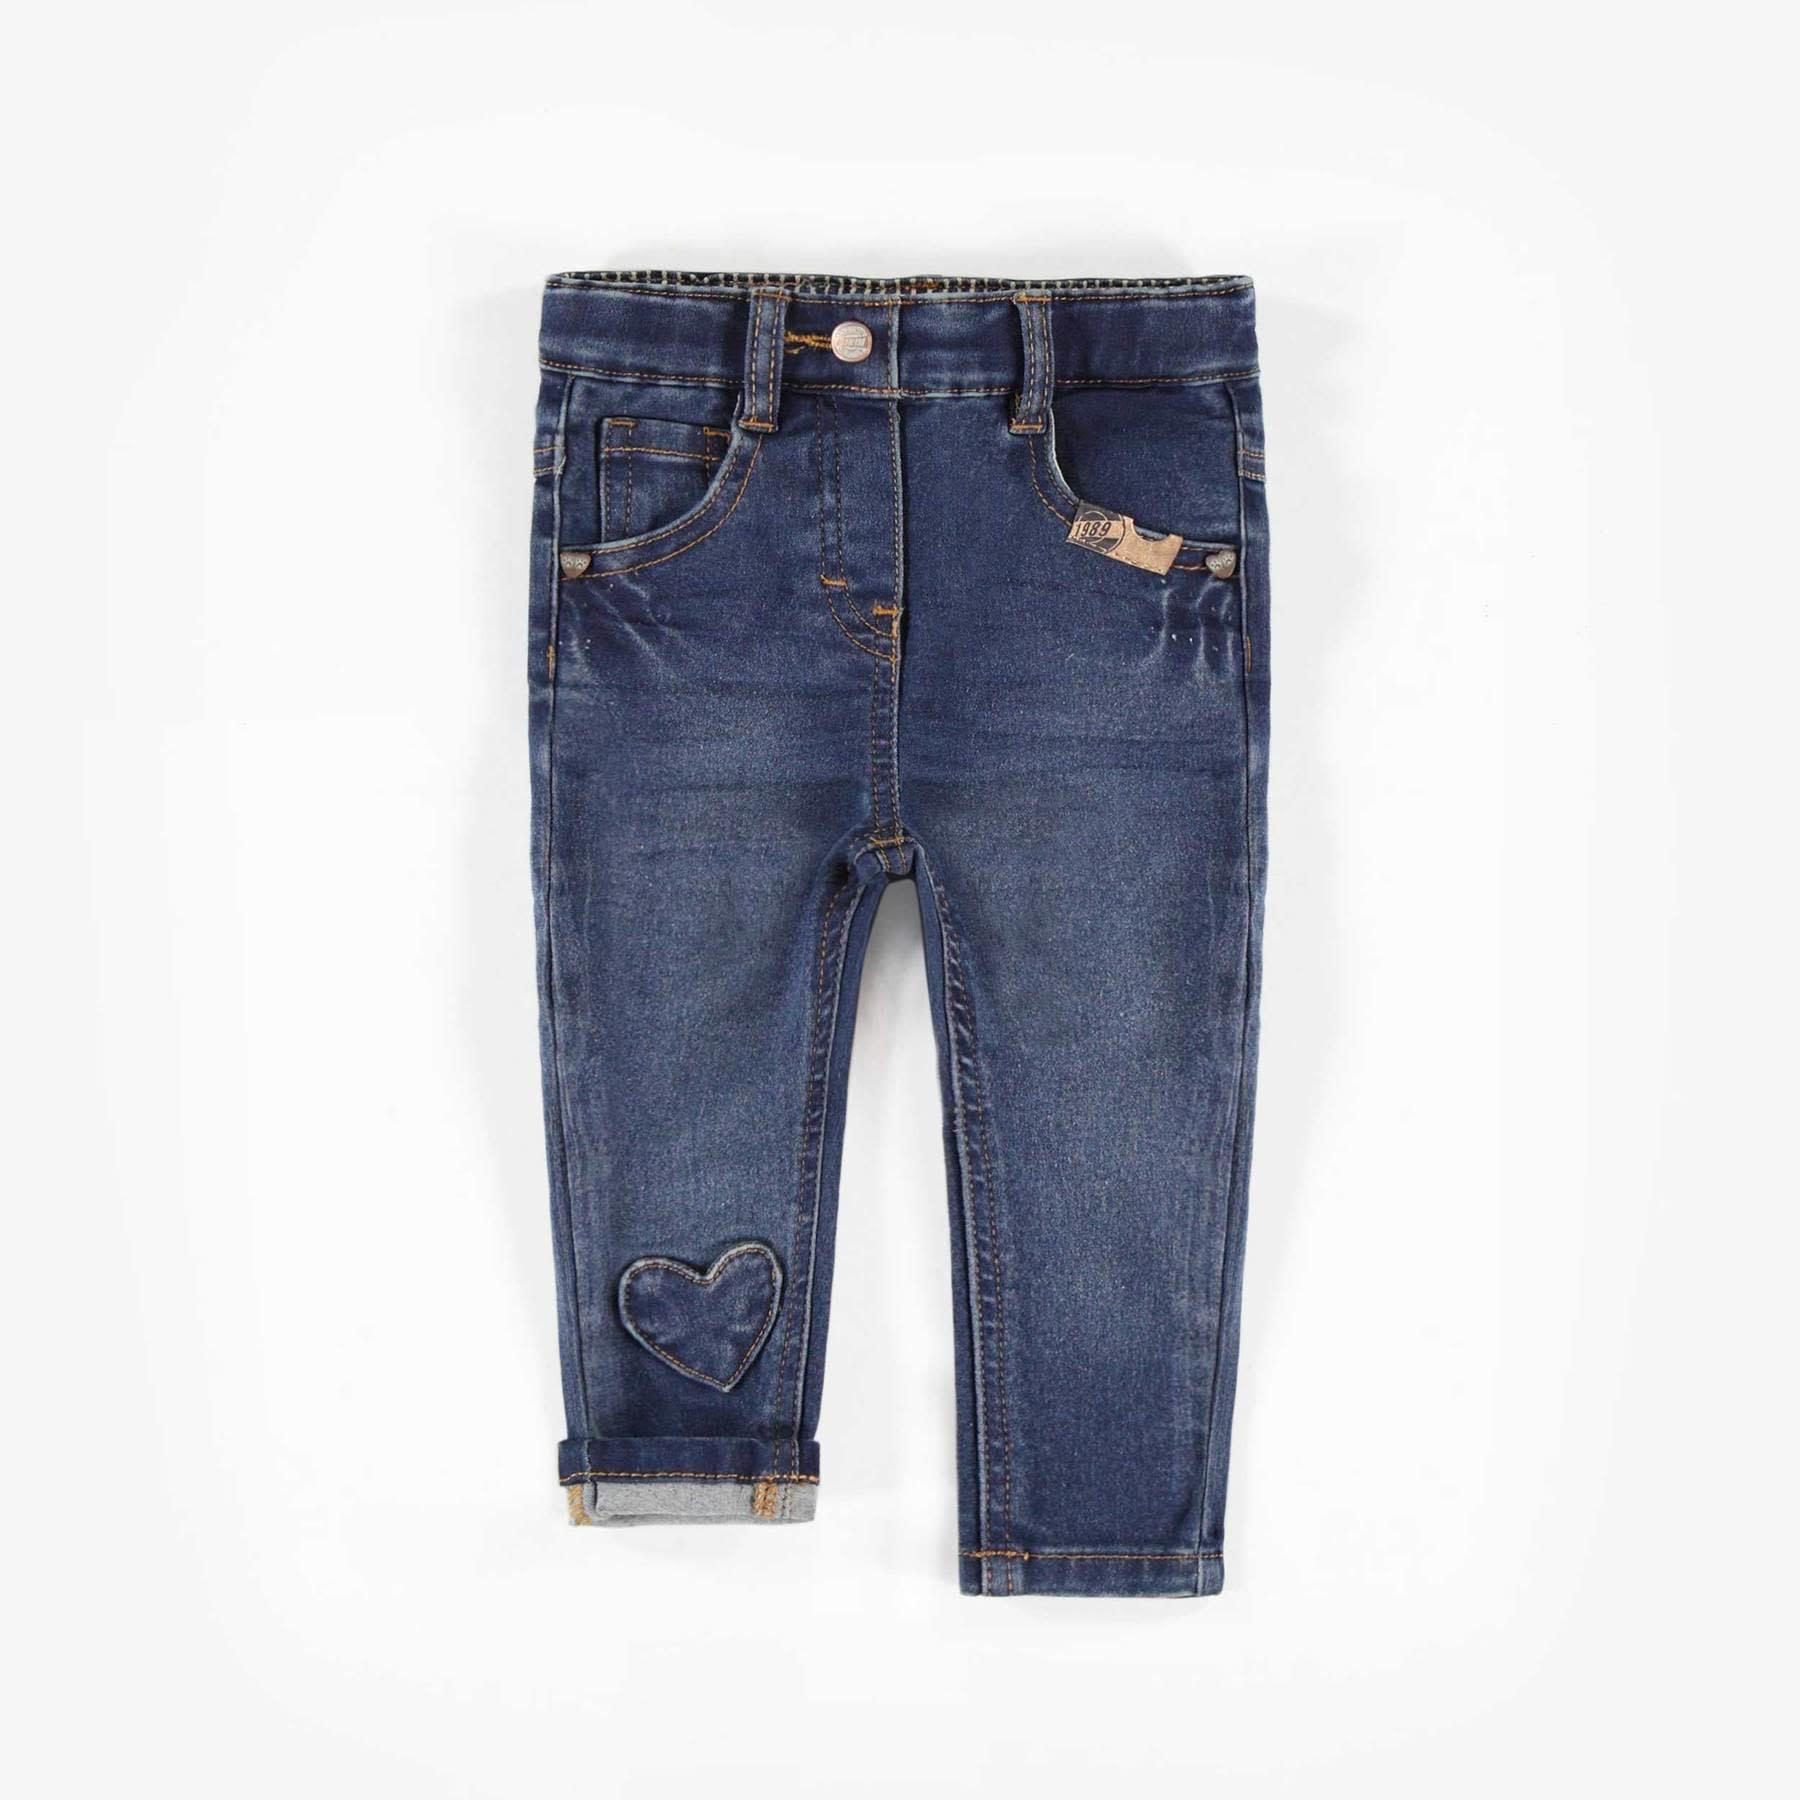 Heart Detail Jeans